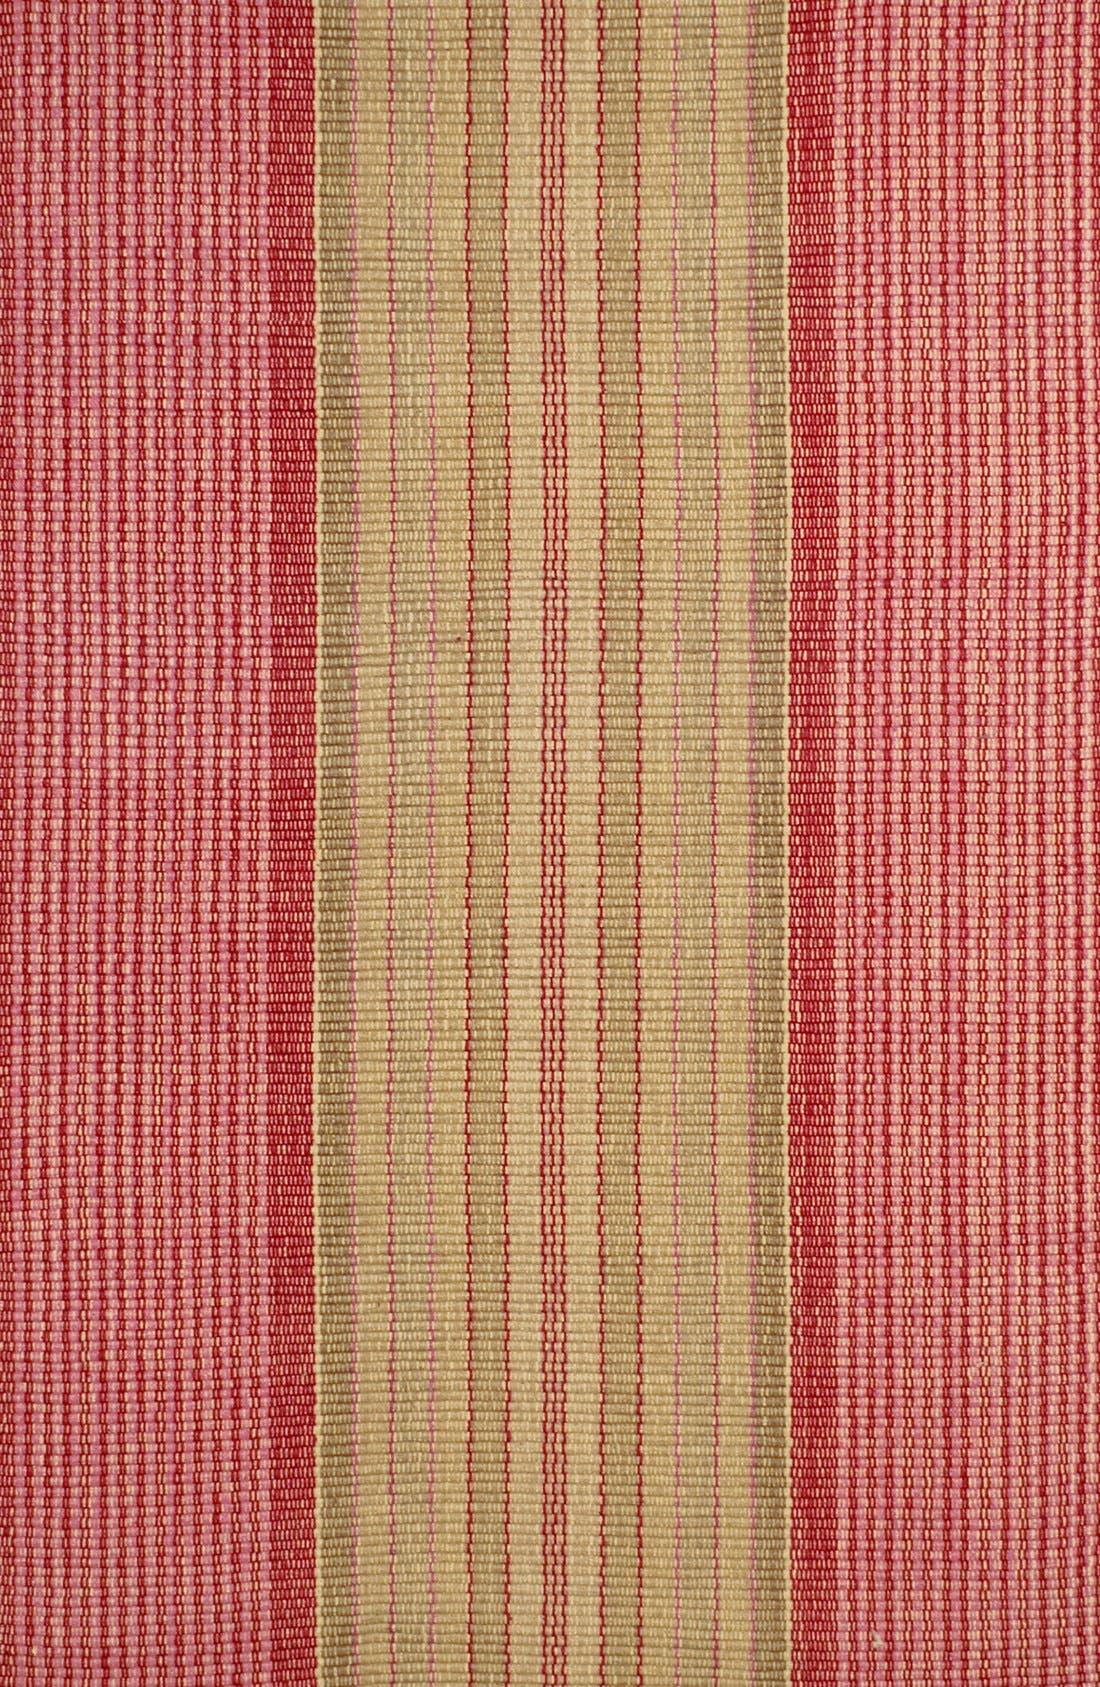 Alternate Image 1 Selected - Dash & Albert 'Framboise' Cotton Rug